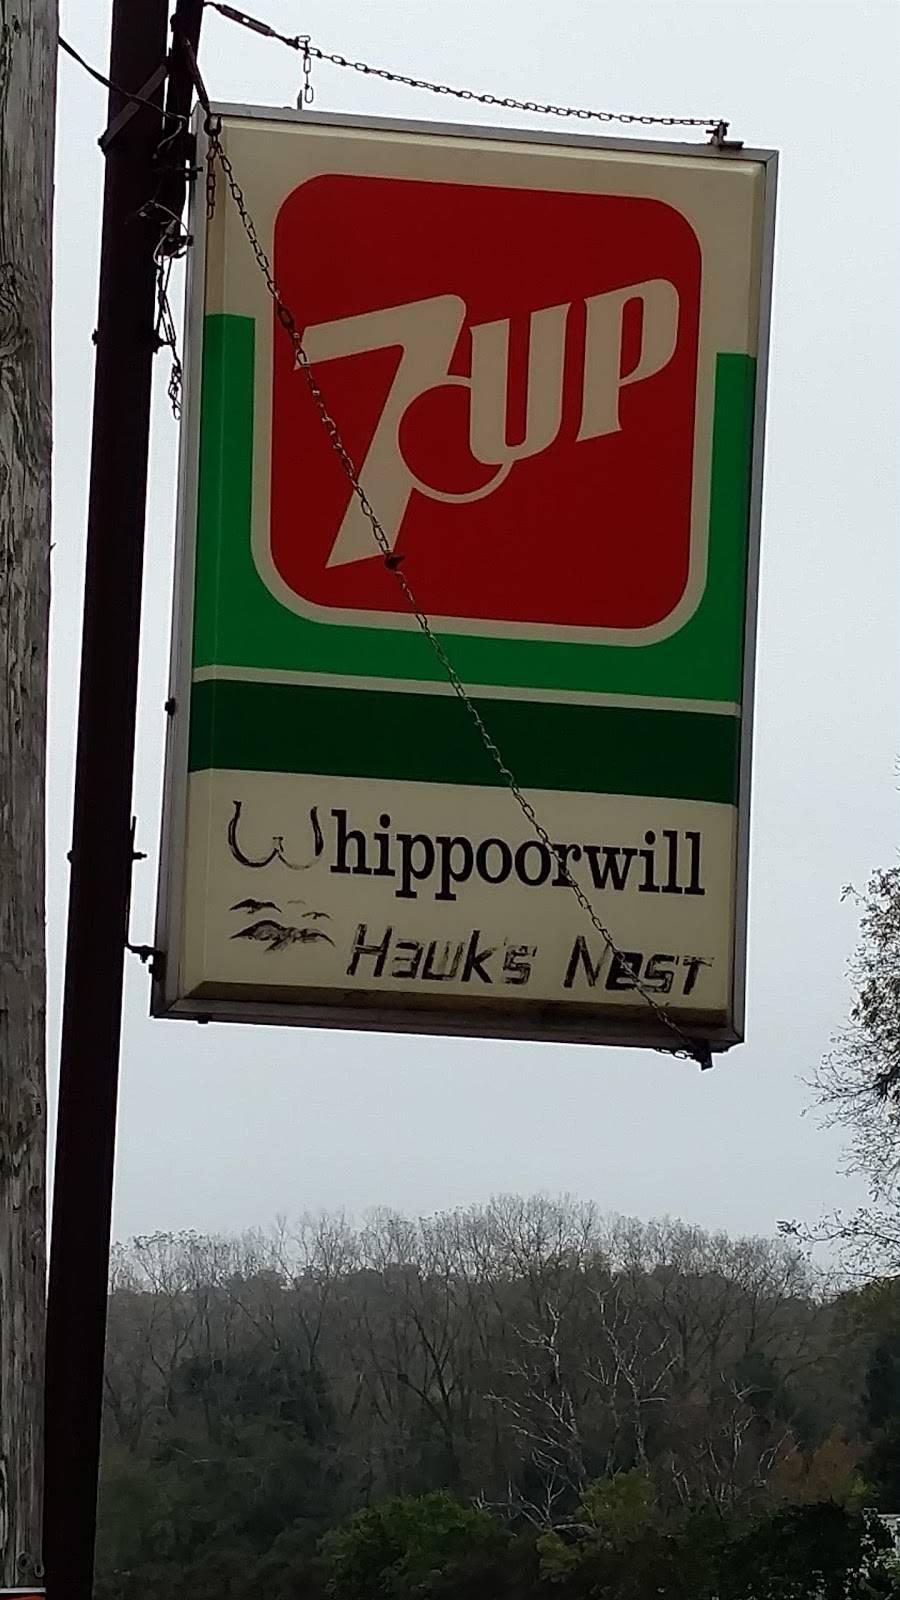 Whippoorwill Hawks Nest - restaurant  | Photo 6 of 10 | Address: 7914 WI-19, Dane, WI 53529, USA | Phone: (608) 798-9991